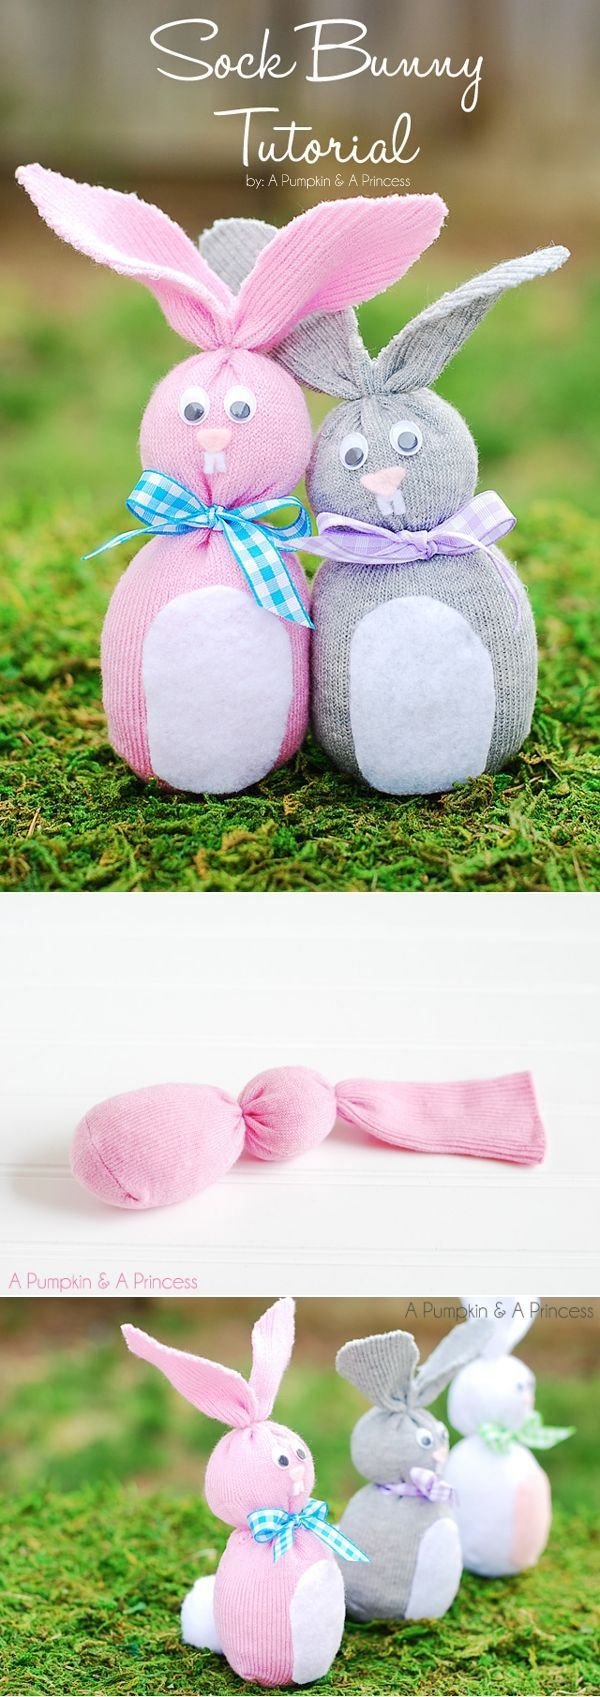 "DIY Sock Bunny from ""A Pumpkin And A Princess"" | DIYINPICS.COM"